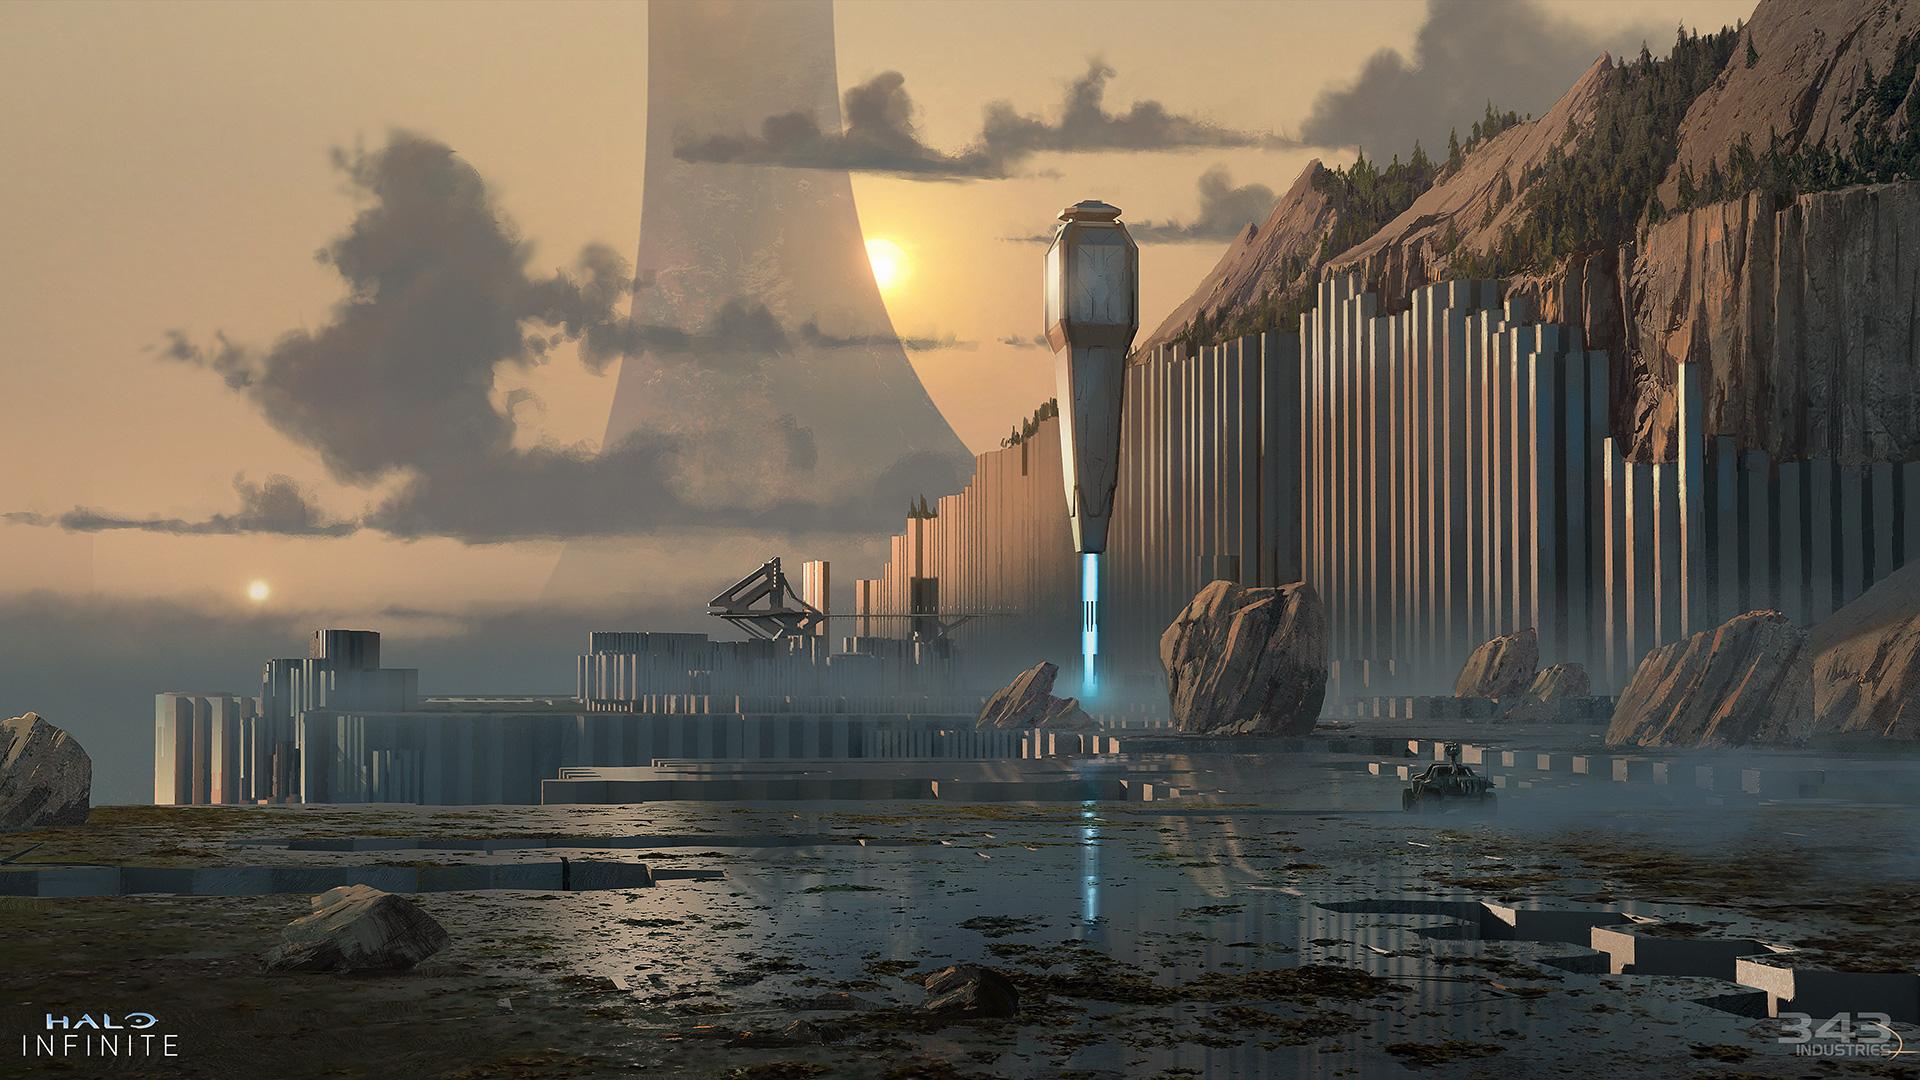 Halo Infinite location